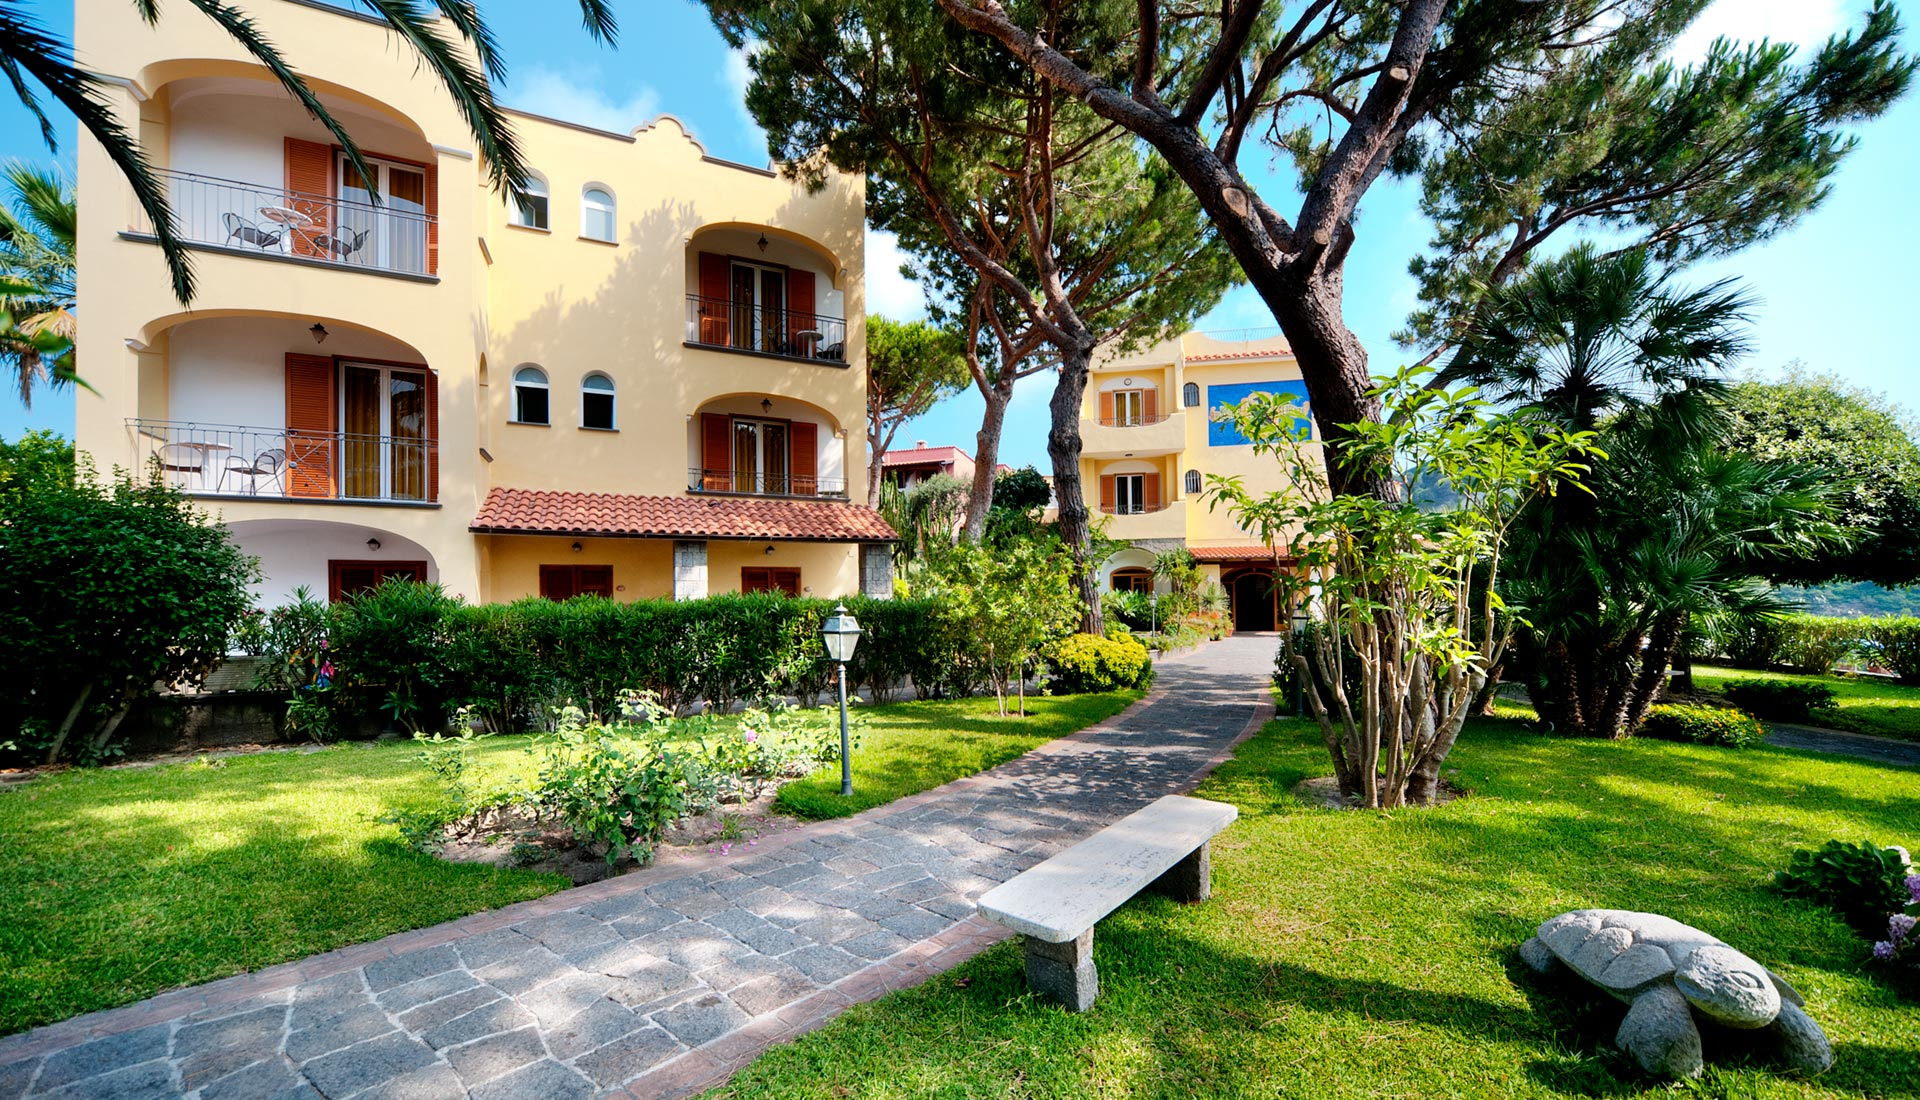 sanlorenzo hotel top